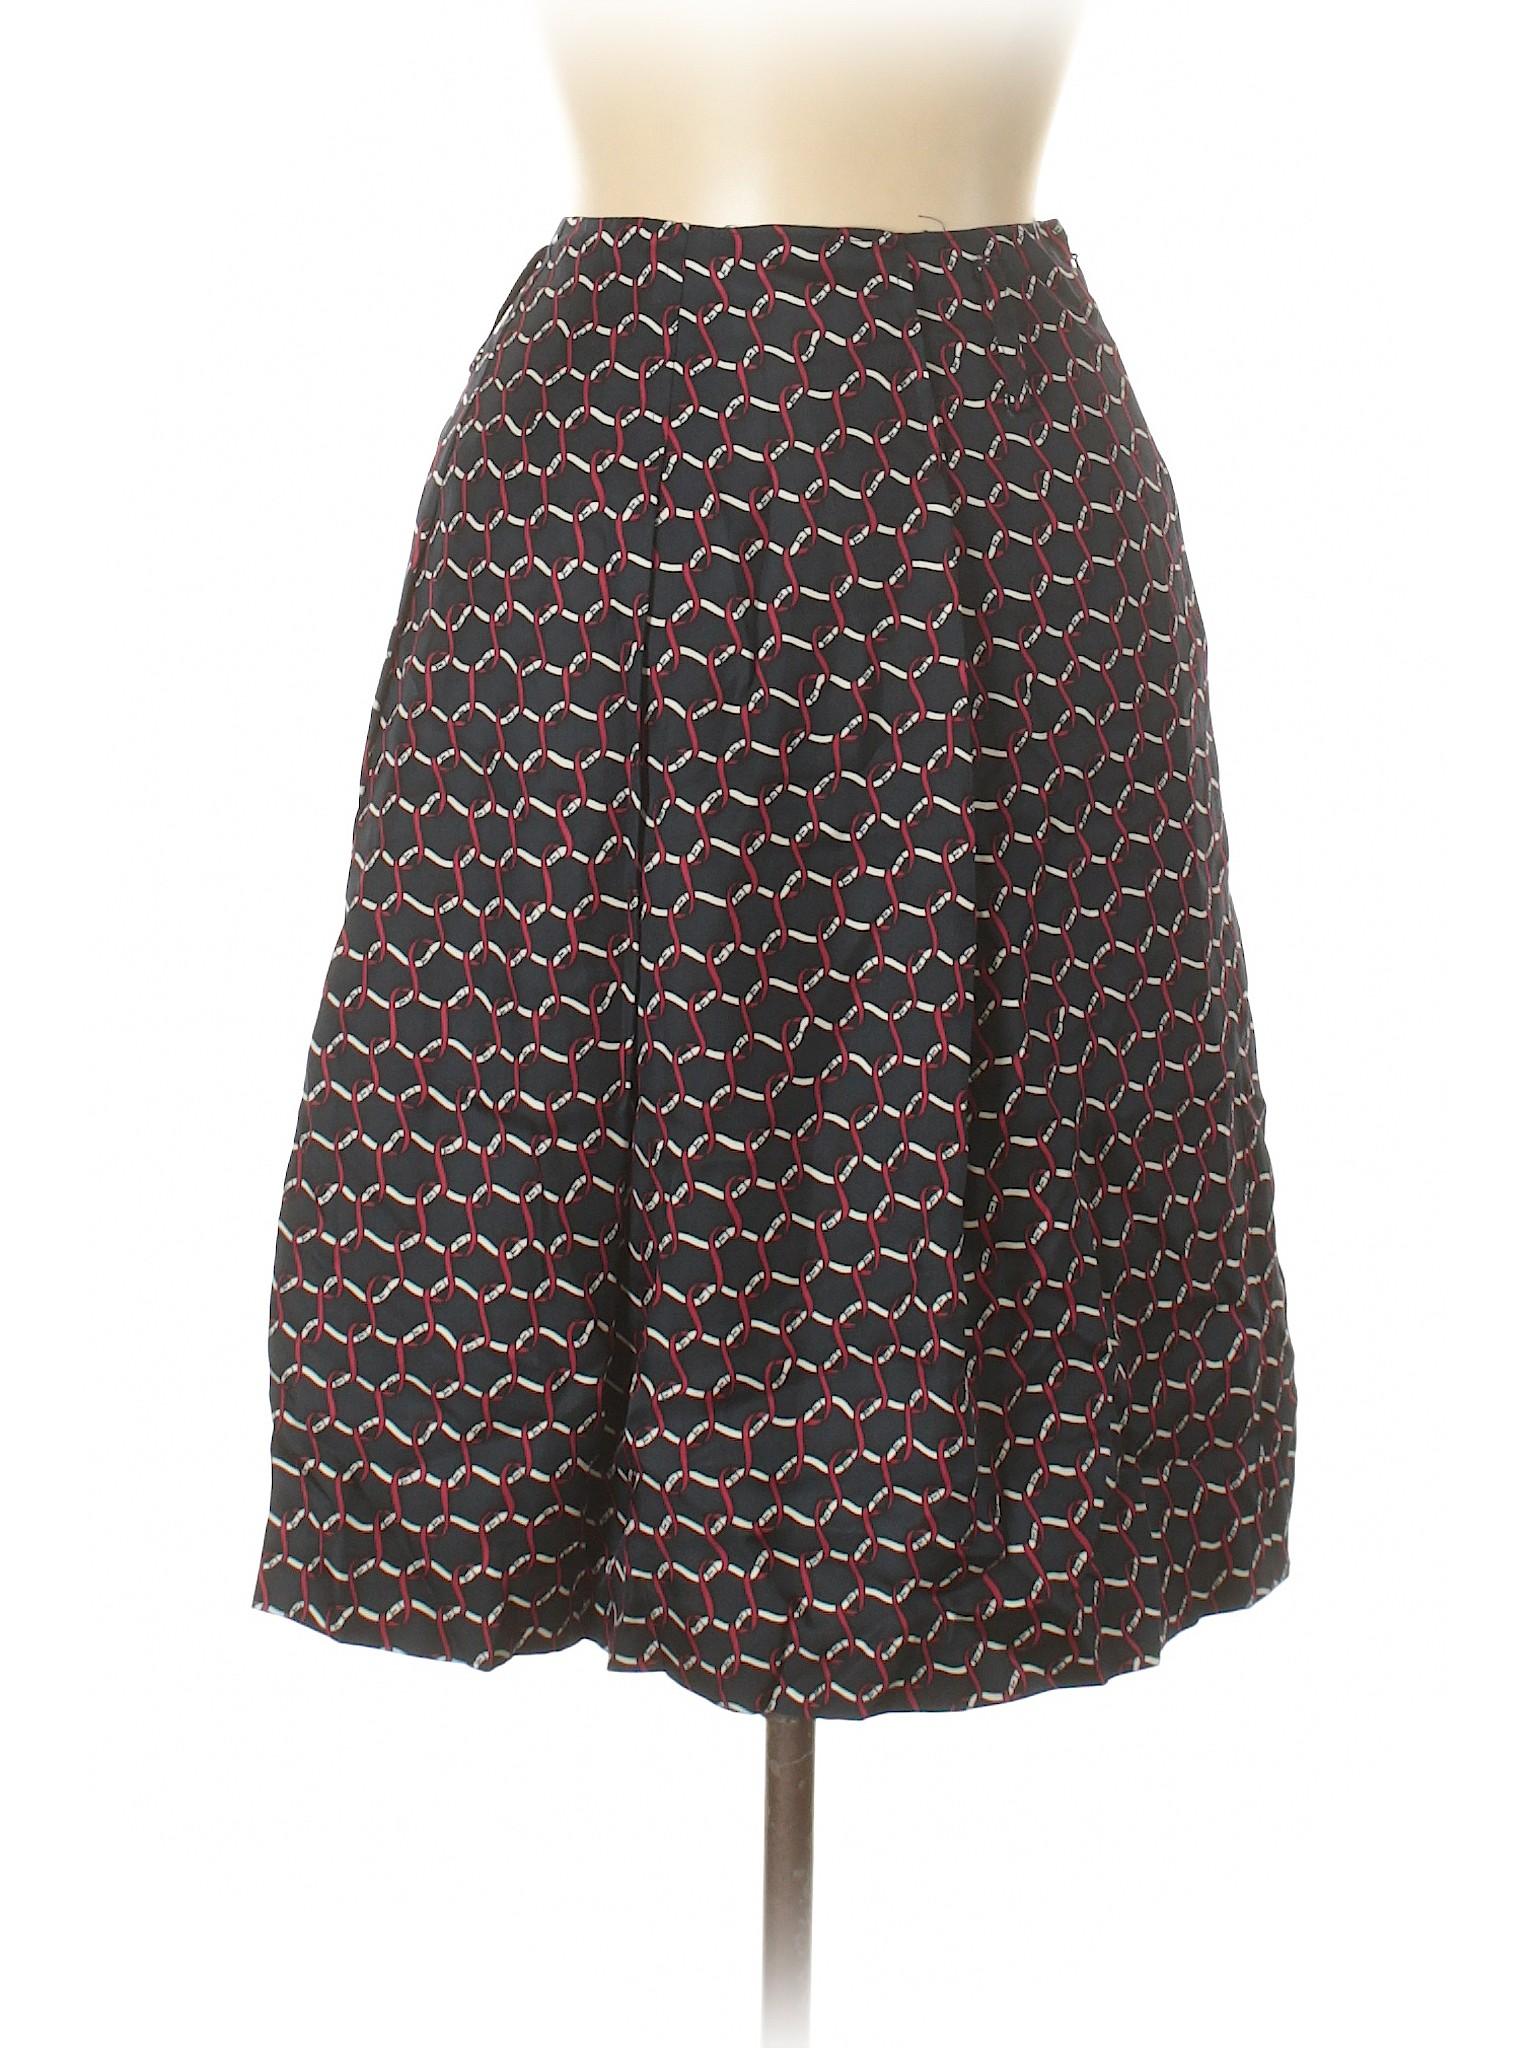 Silk leisure leisure Boutique Boutique Skirt Talbots Skirt Silk leisure Boutique Talbots fXZT1cZ